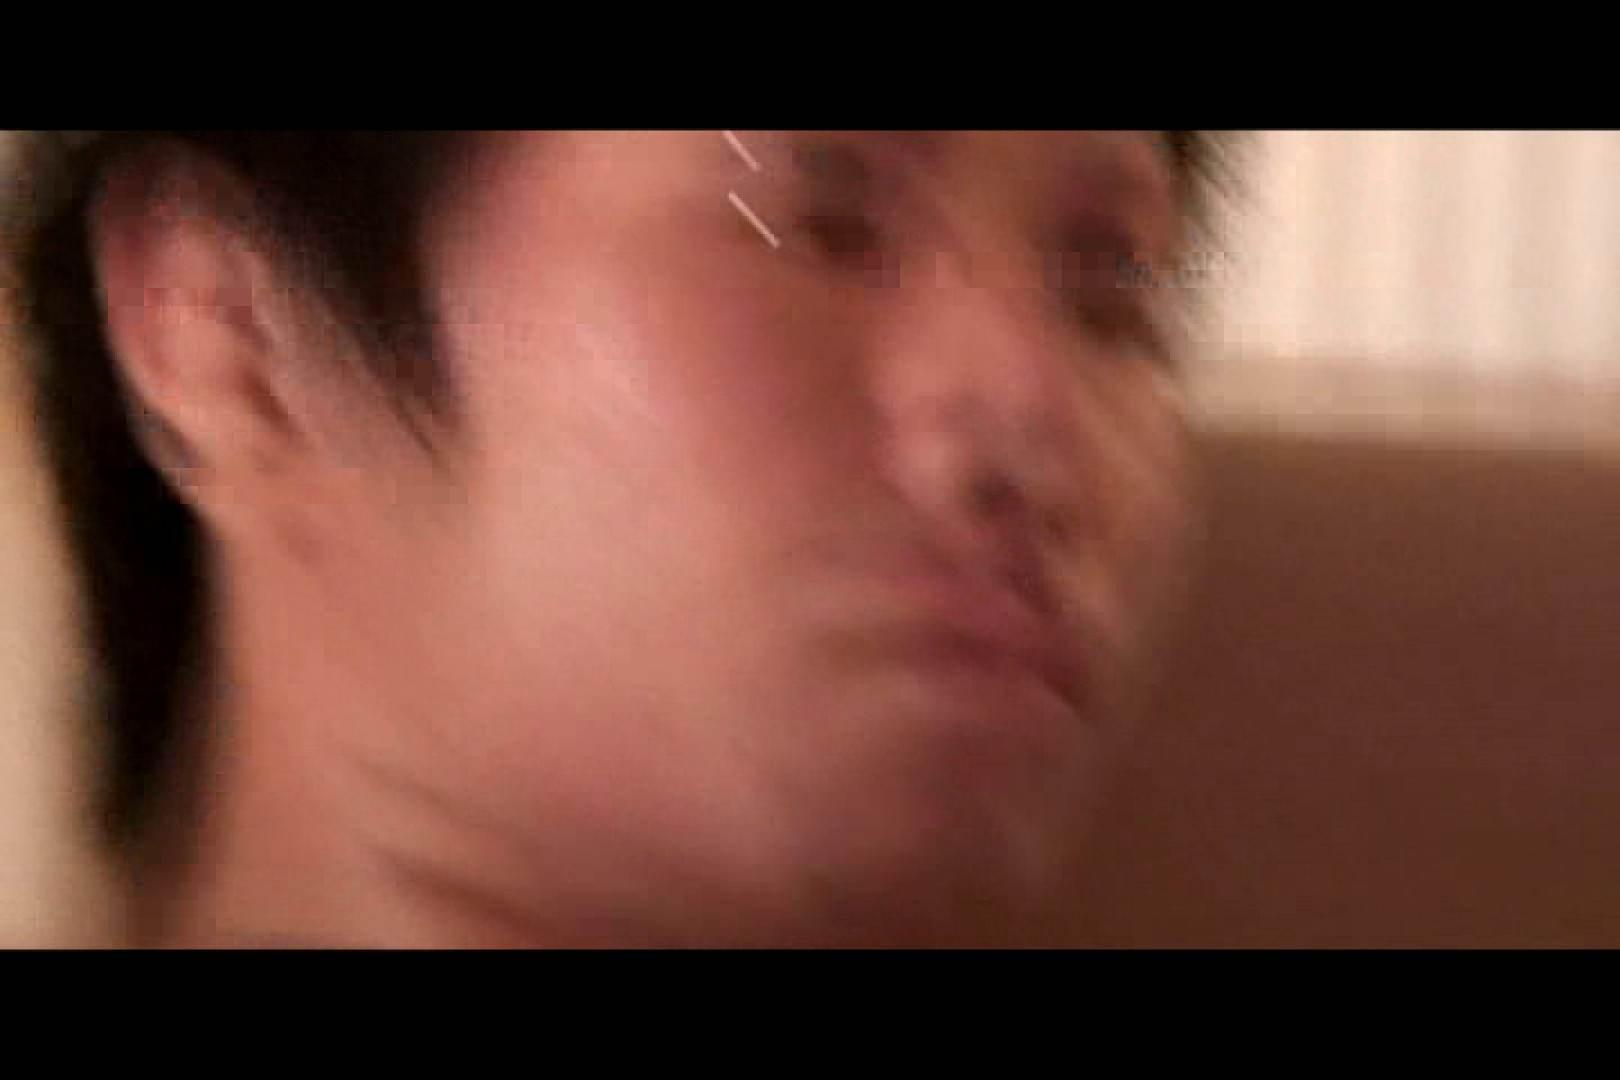 Bistro「イケメン」~Mokkori和風仕立て~vol.03 ゲイのオナニー映像 男同士動画 90枚 82